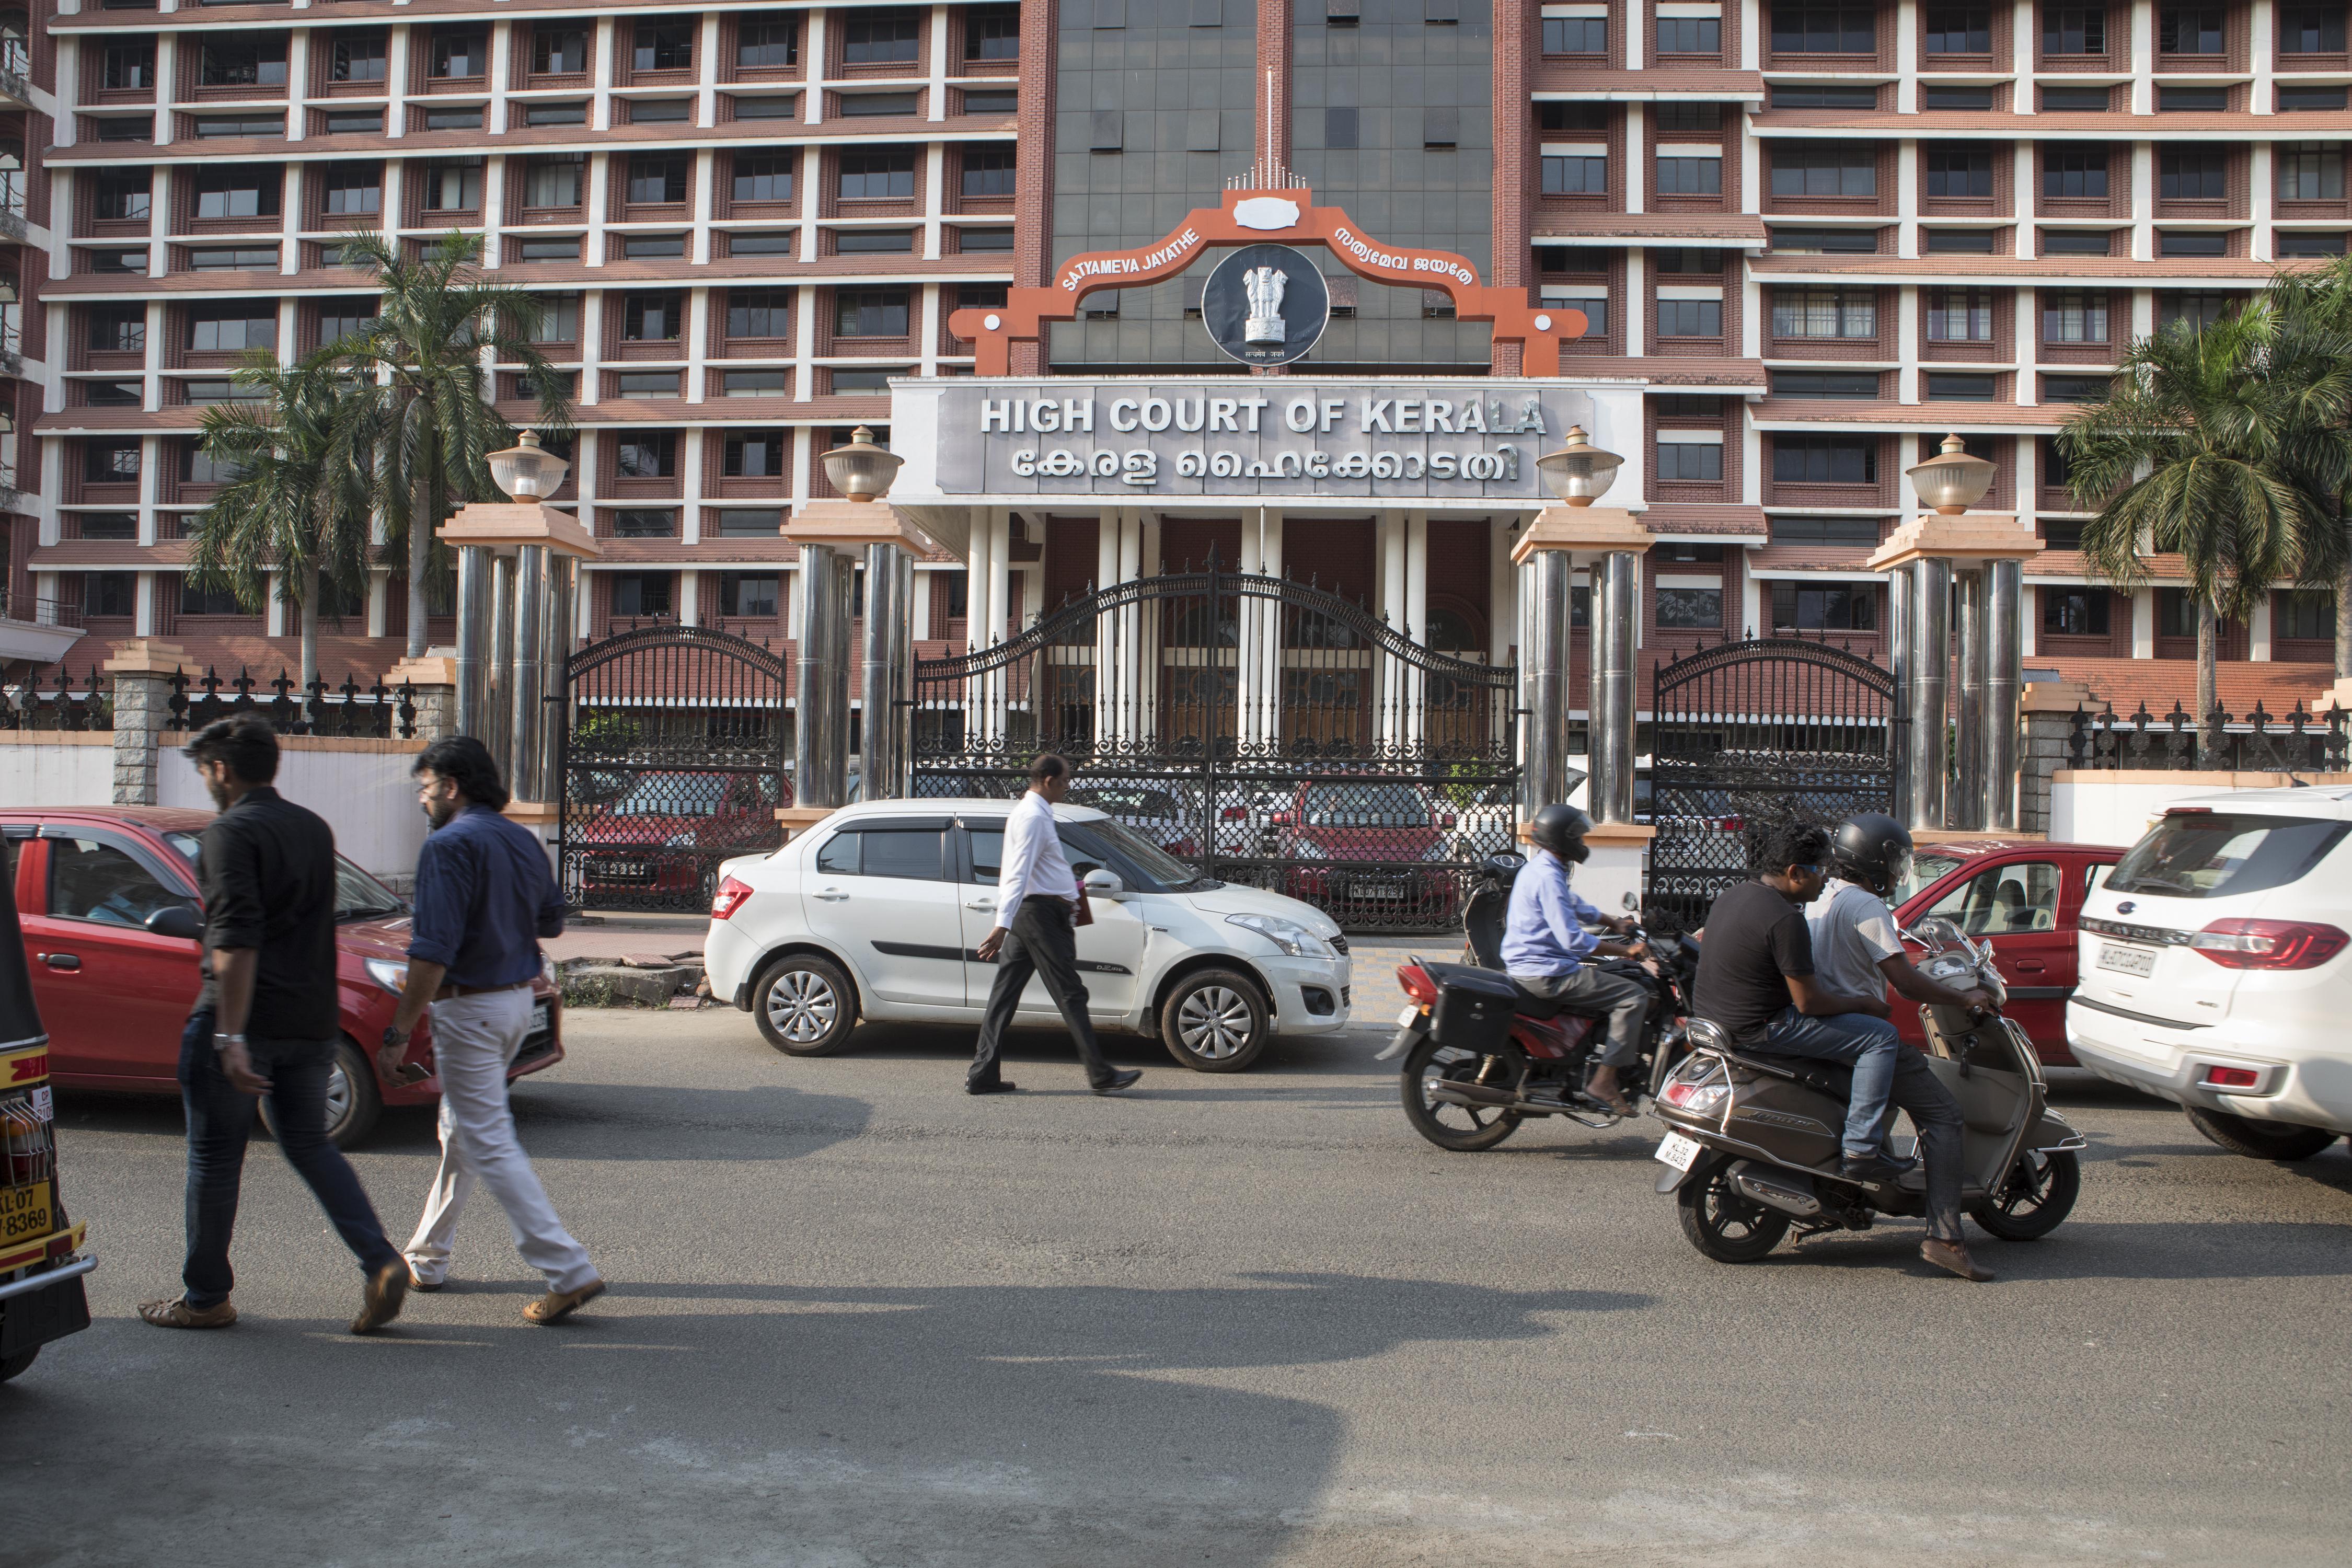 Kerala High Court (Samyukta Lakshmi/The New York Times)